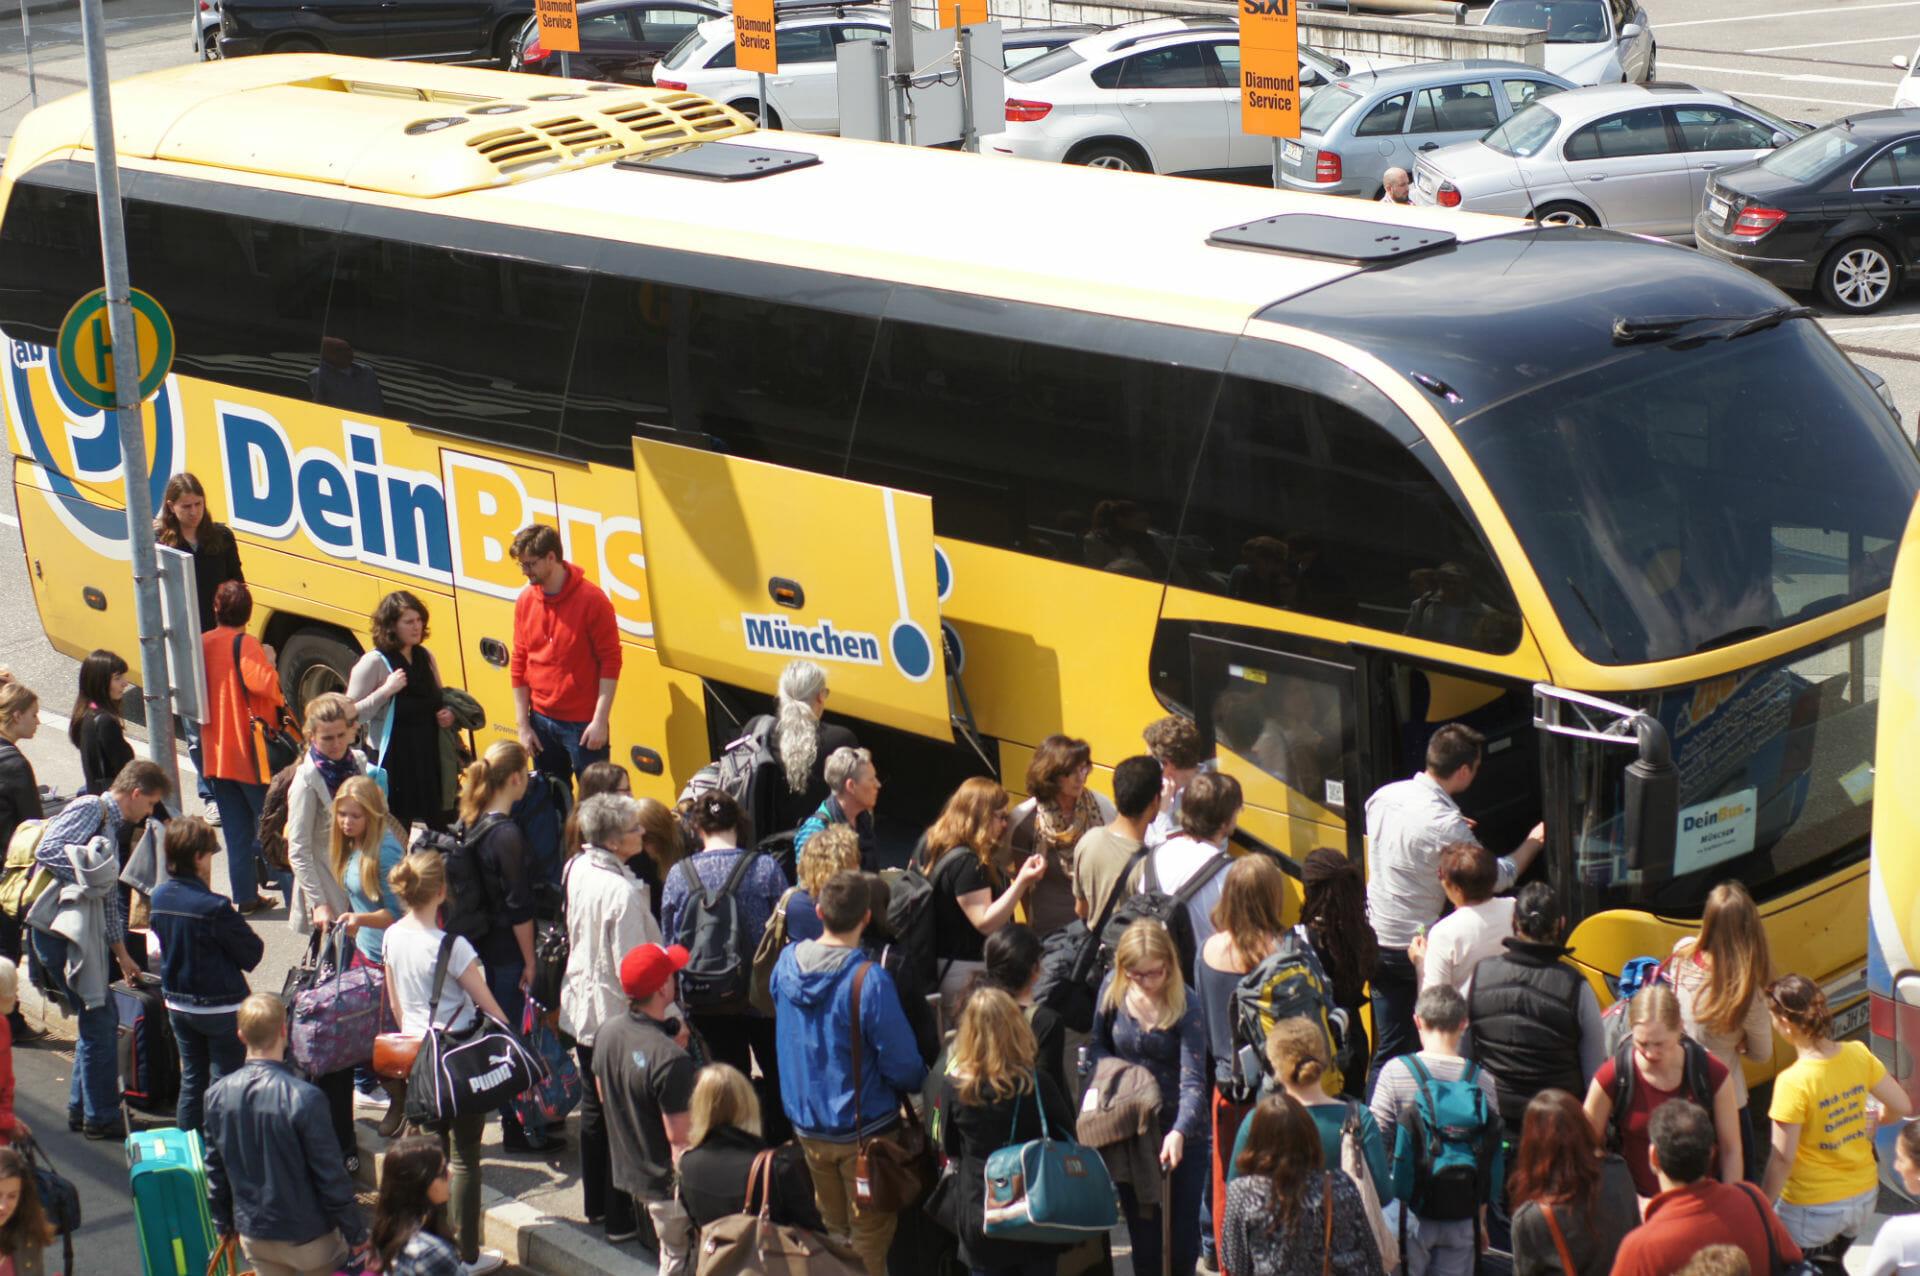 Fahrgäste vor einem Fernbus